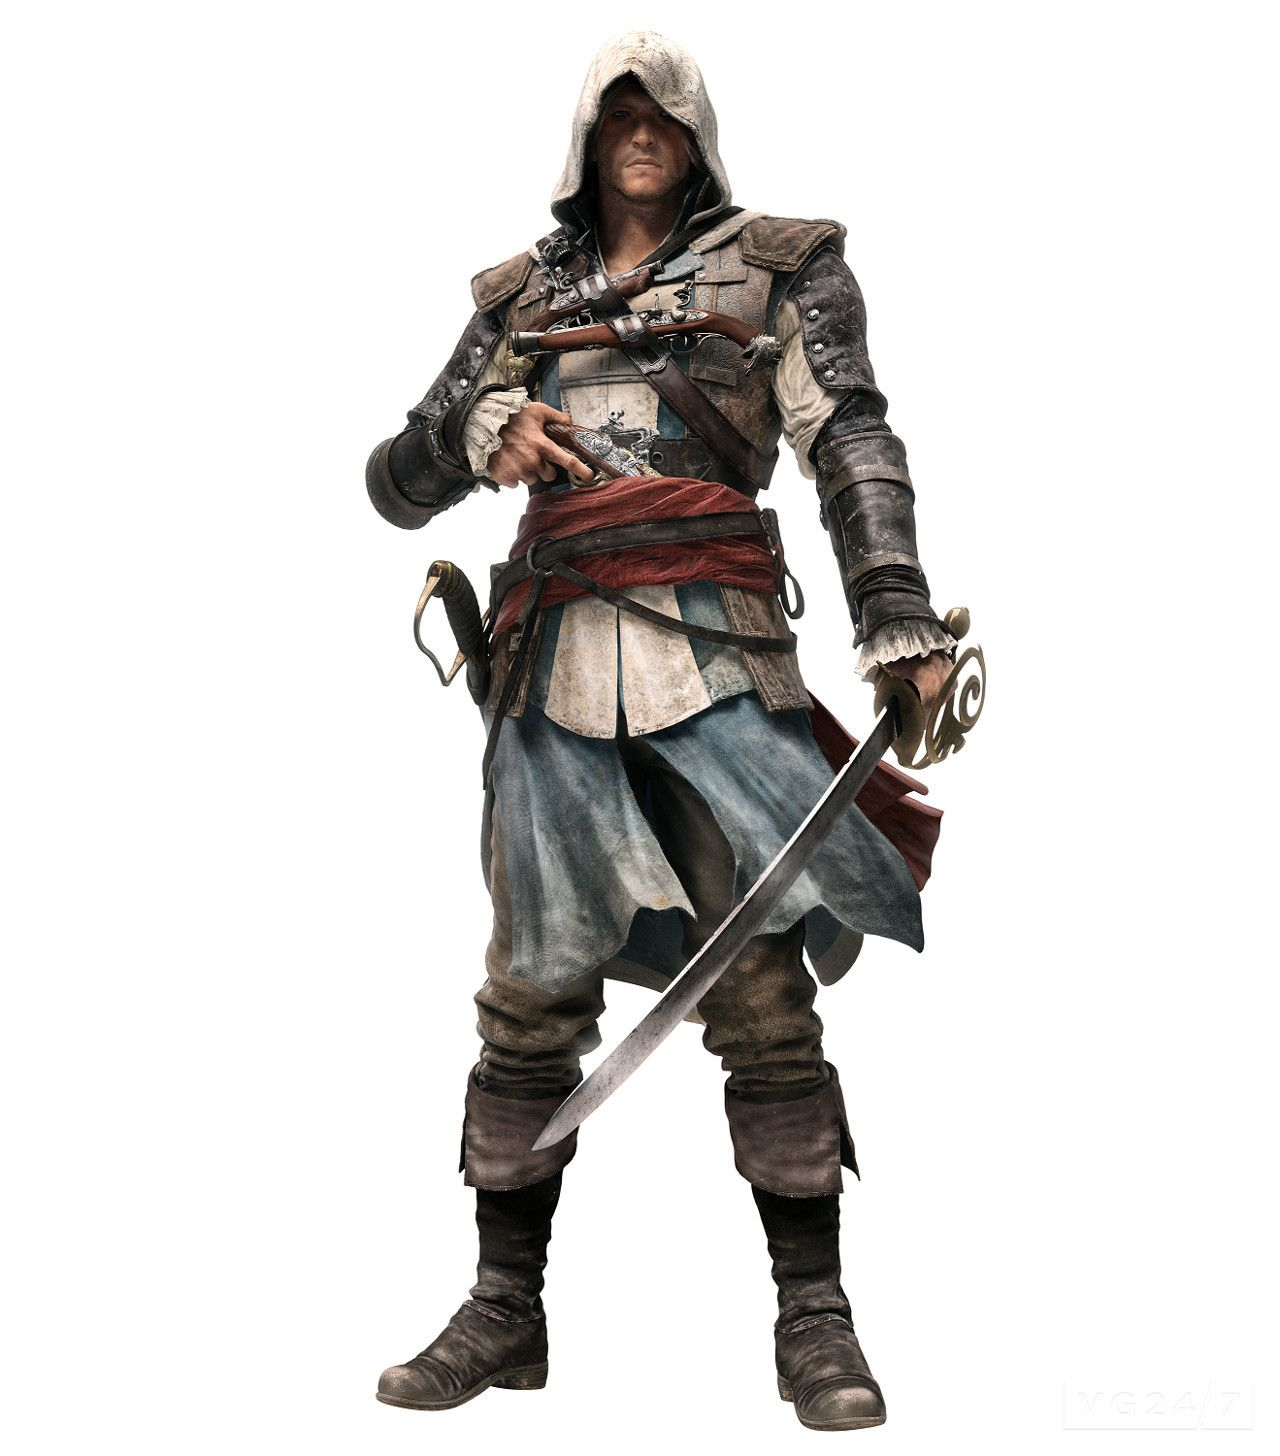 http://game-insider.com/wp-content/uploads/2013/04/Assassins-creed-4-black-flag-131.jpg